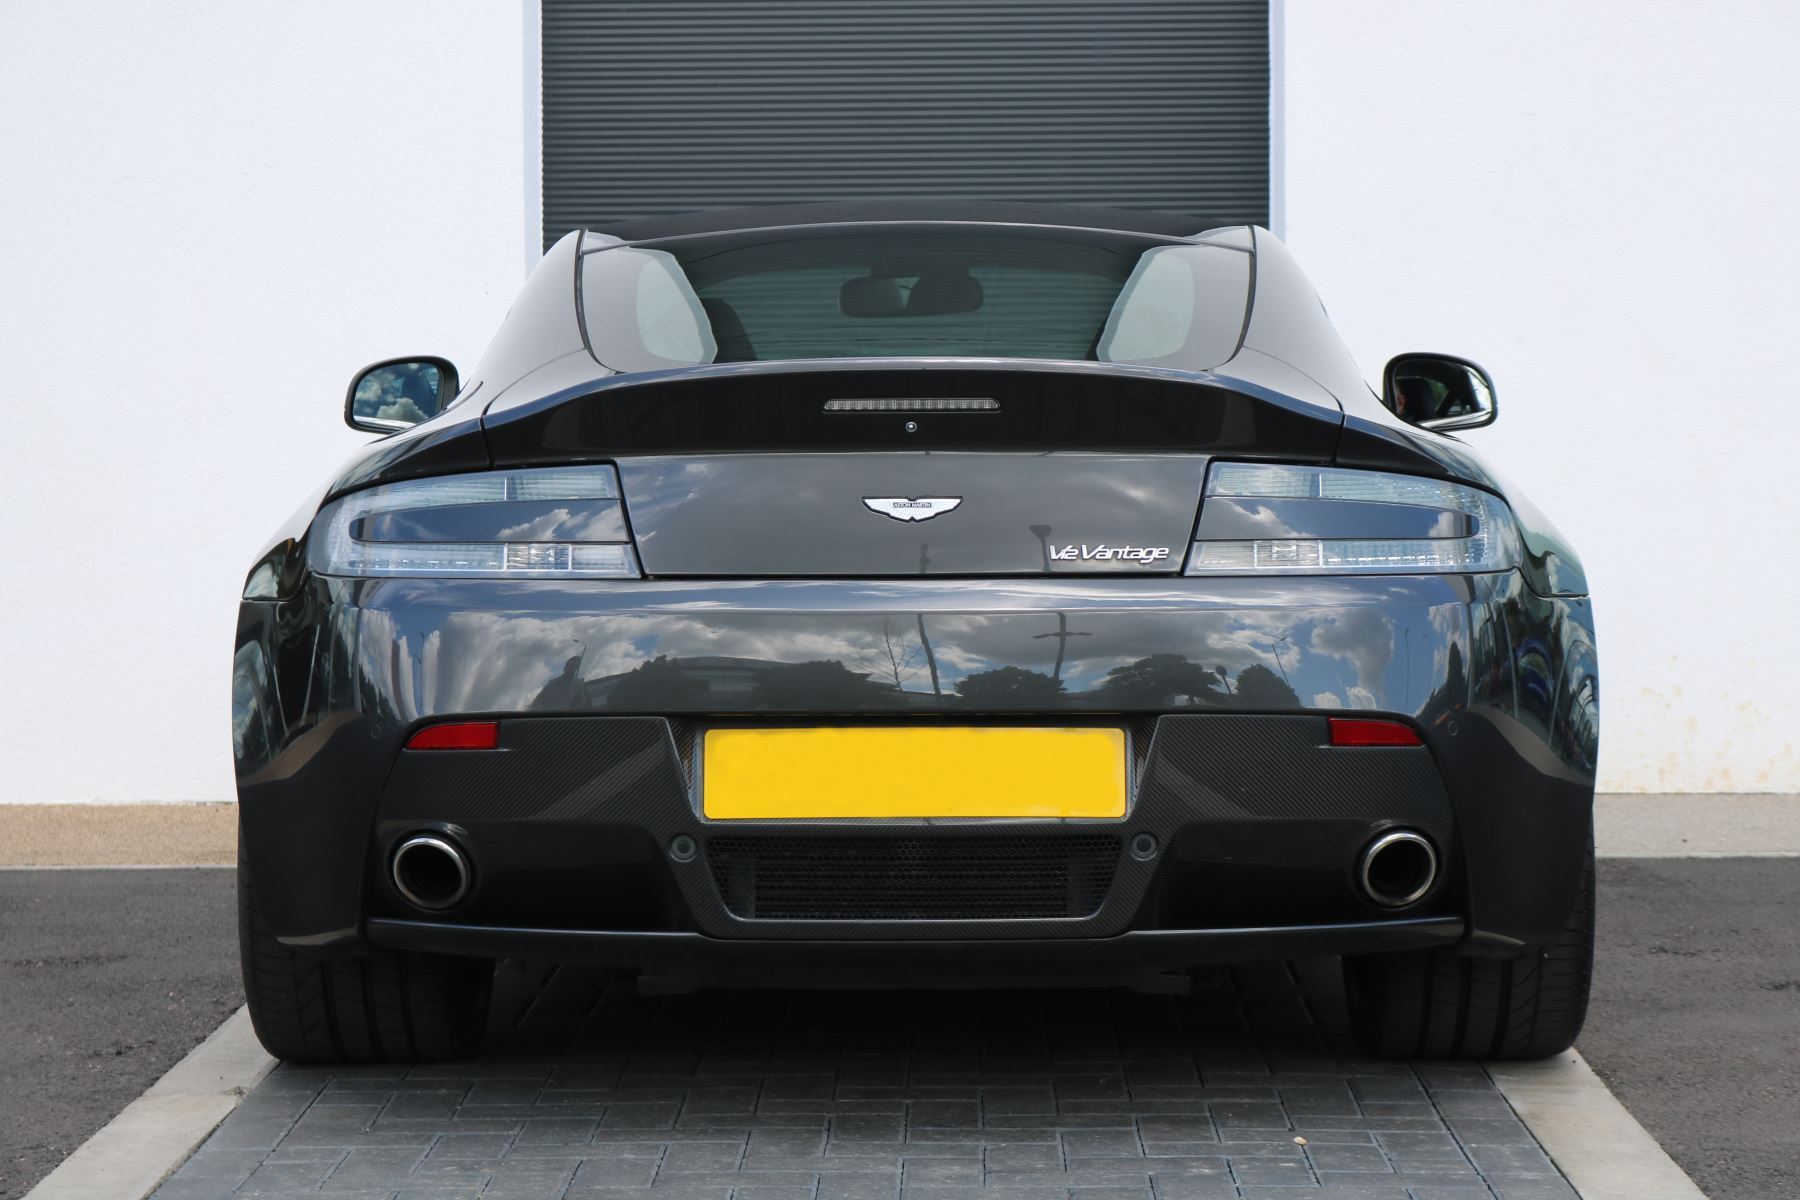 Aston Martin V12 Vantage 2dr image 5